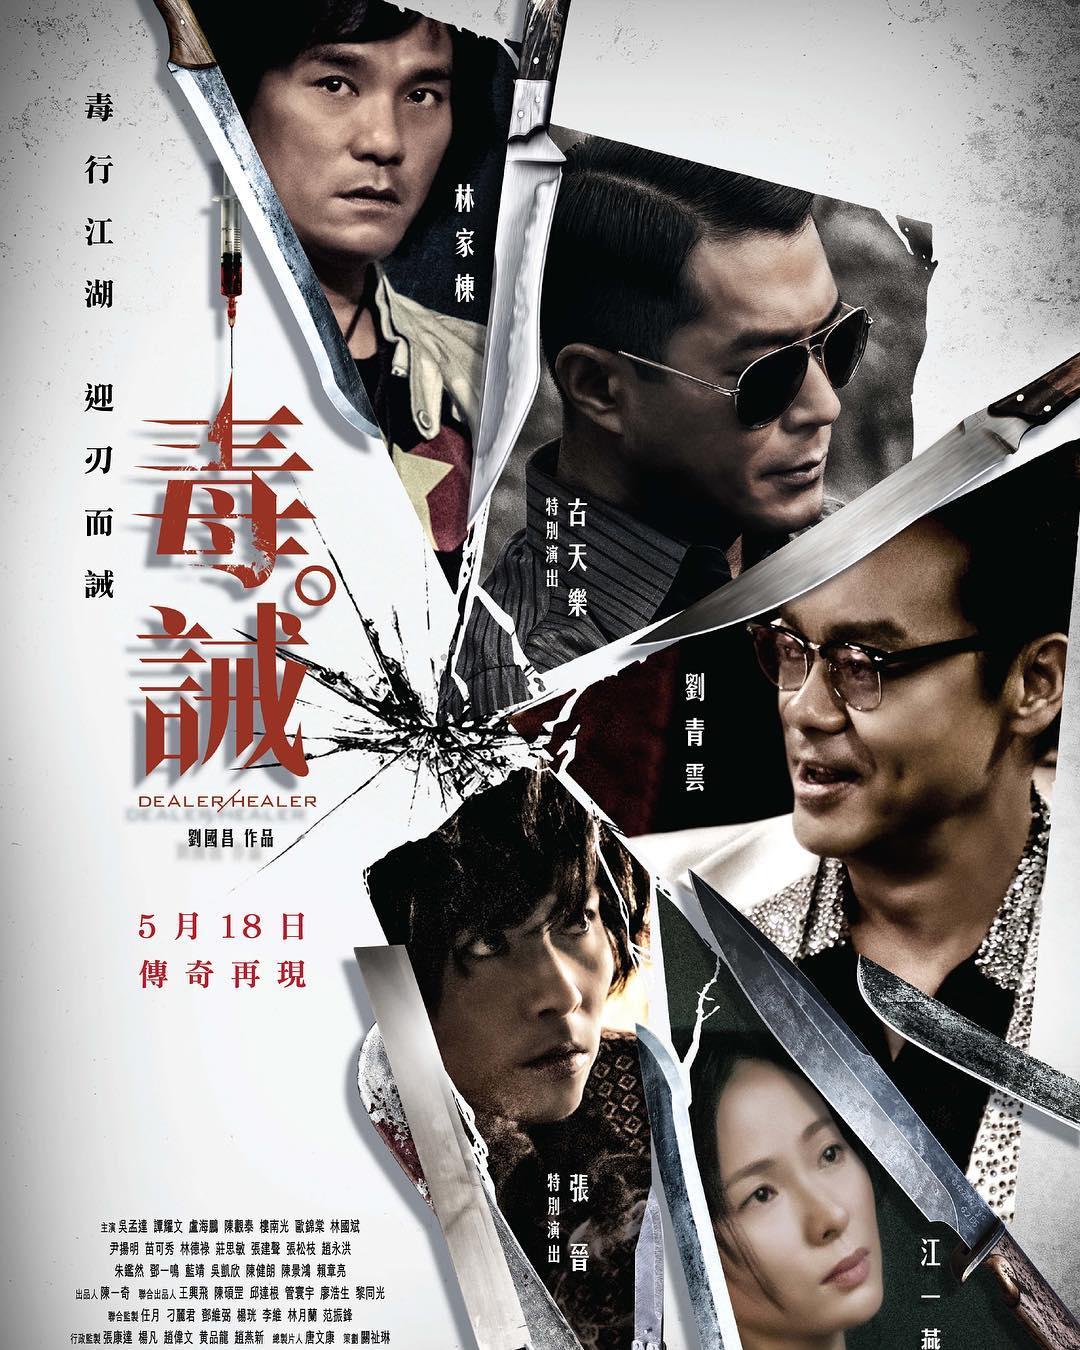 image Duk gai Watch Full Movie Free Online